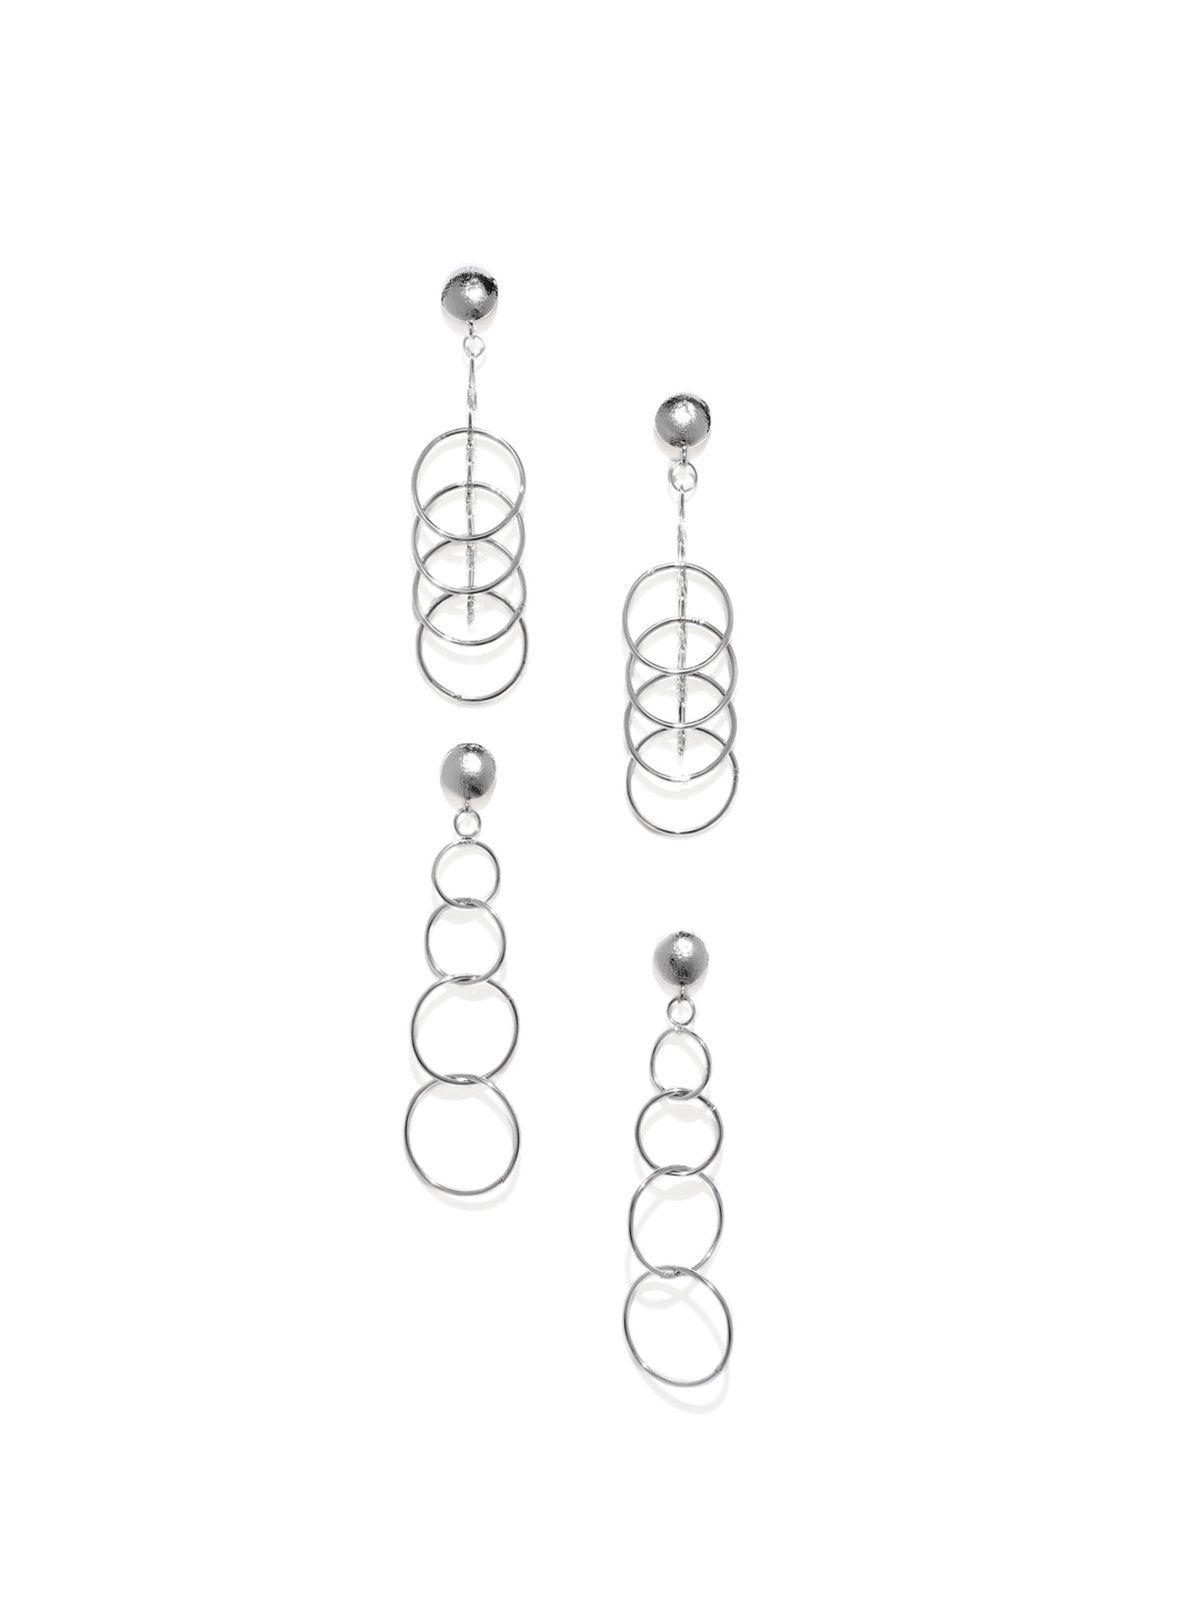 Combo of silver tone multi layer rings dangler earring zaveri